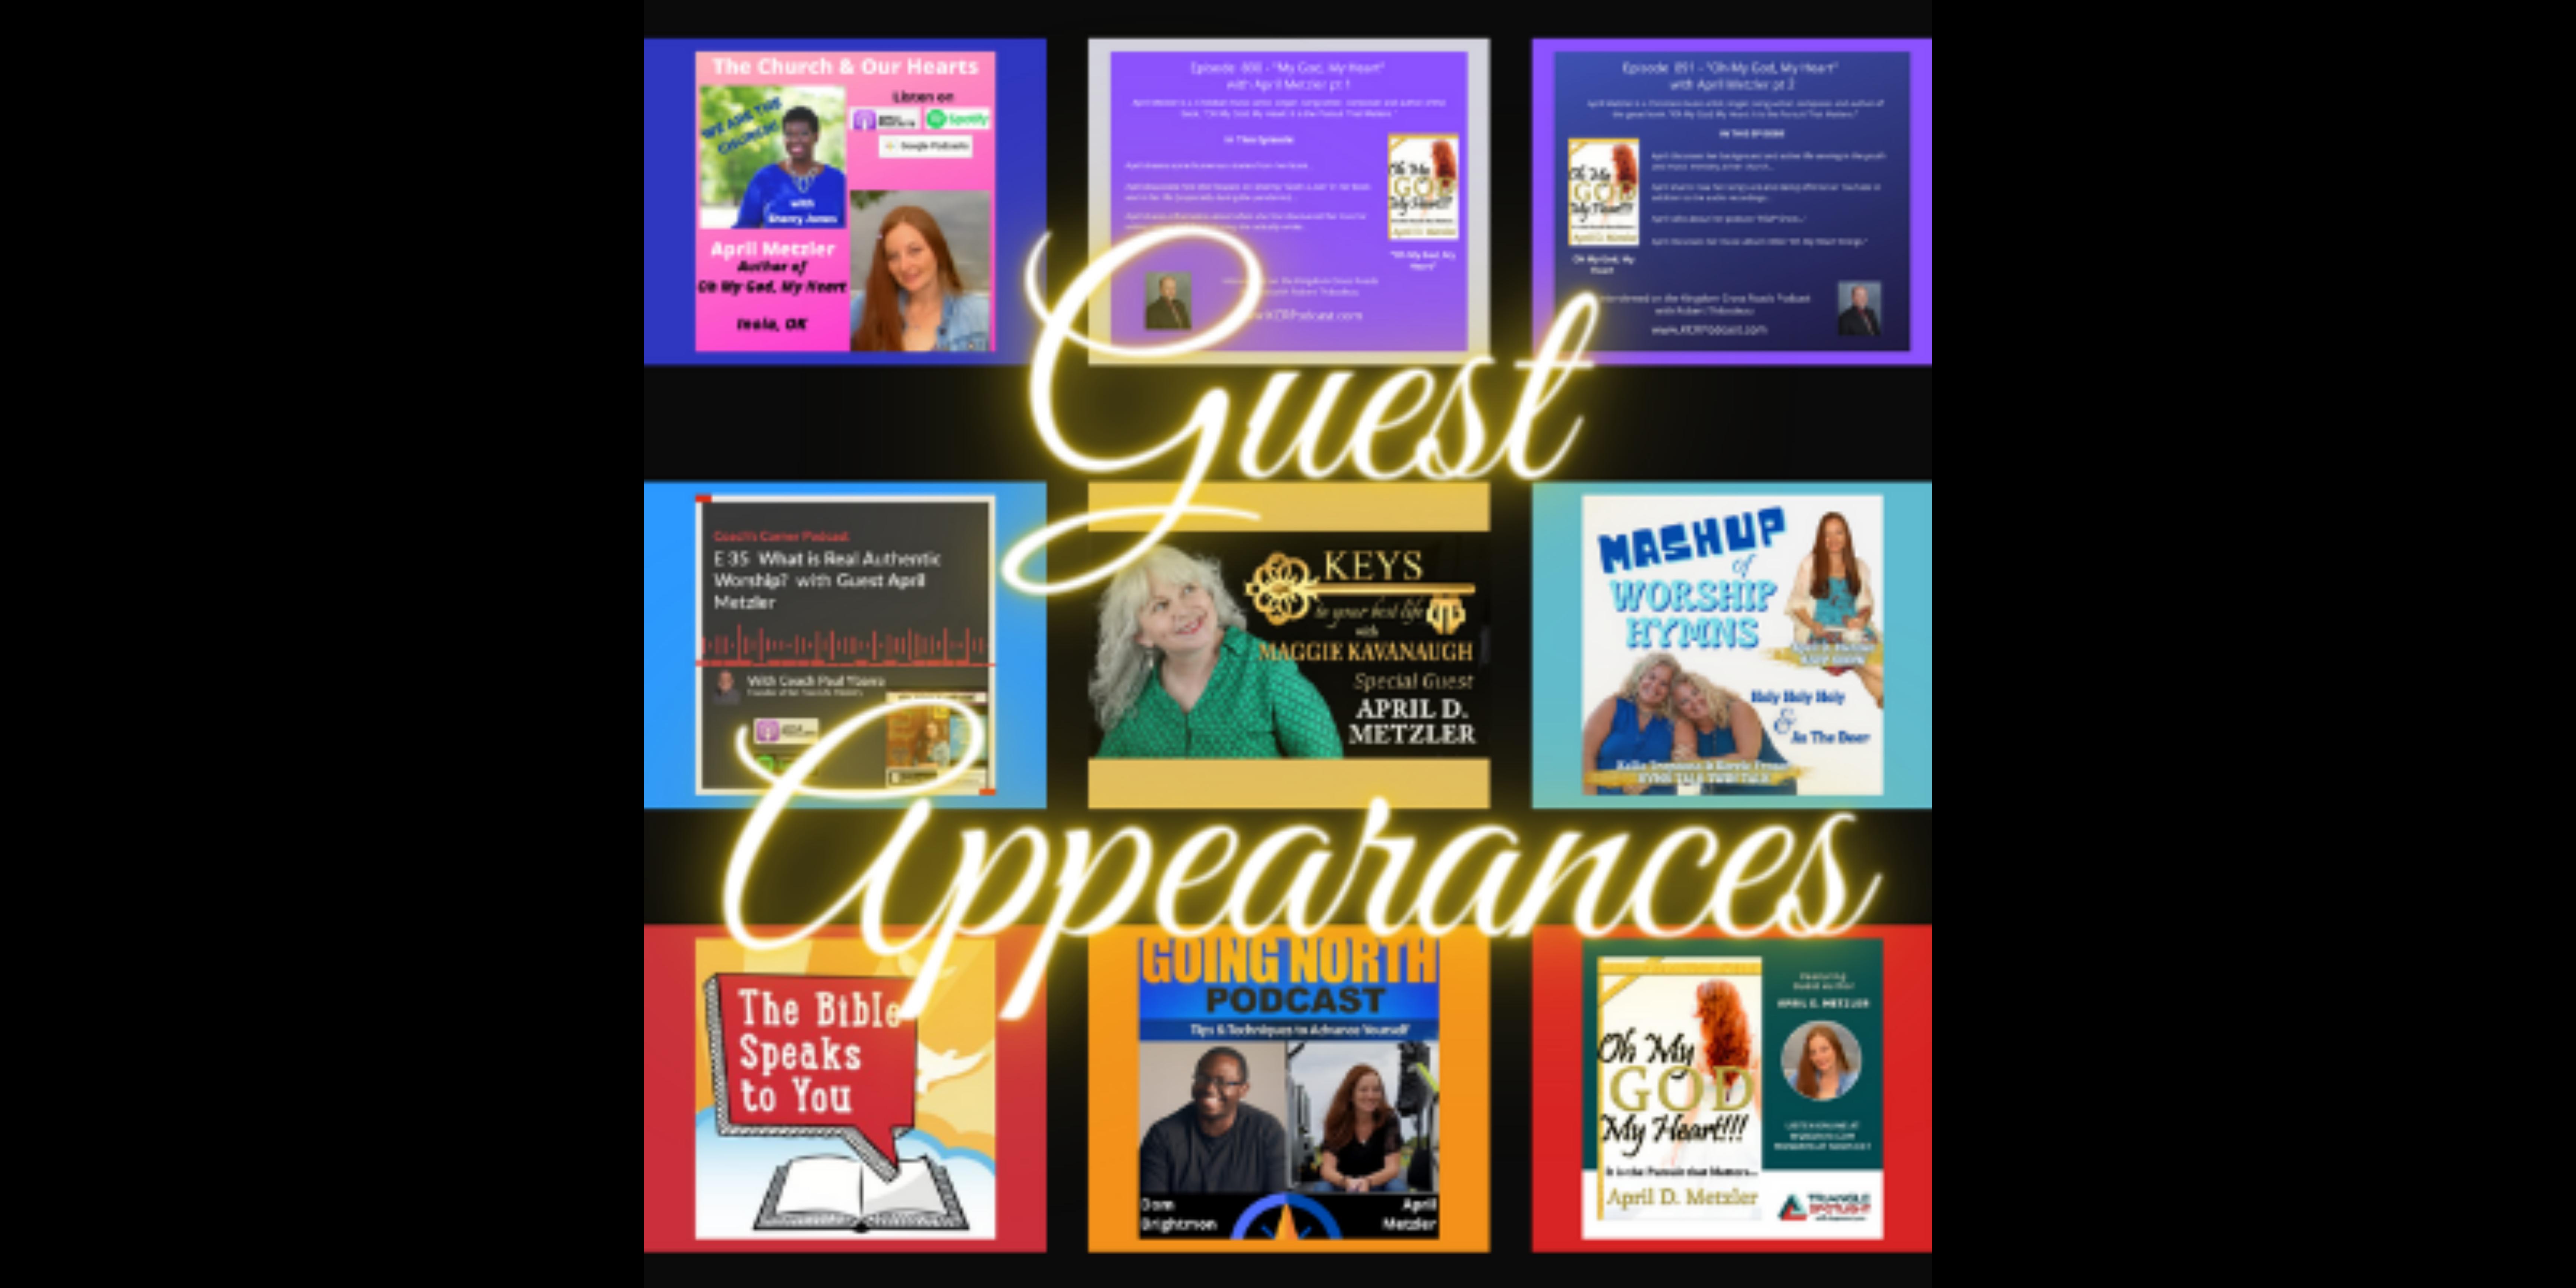 Guest Appearances page header for April D. Metzler